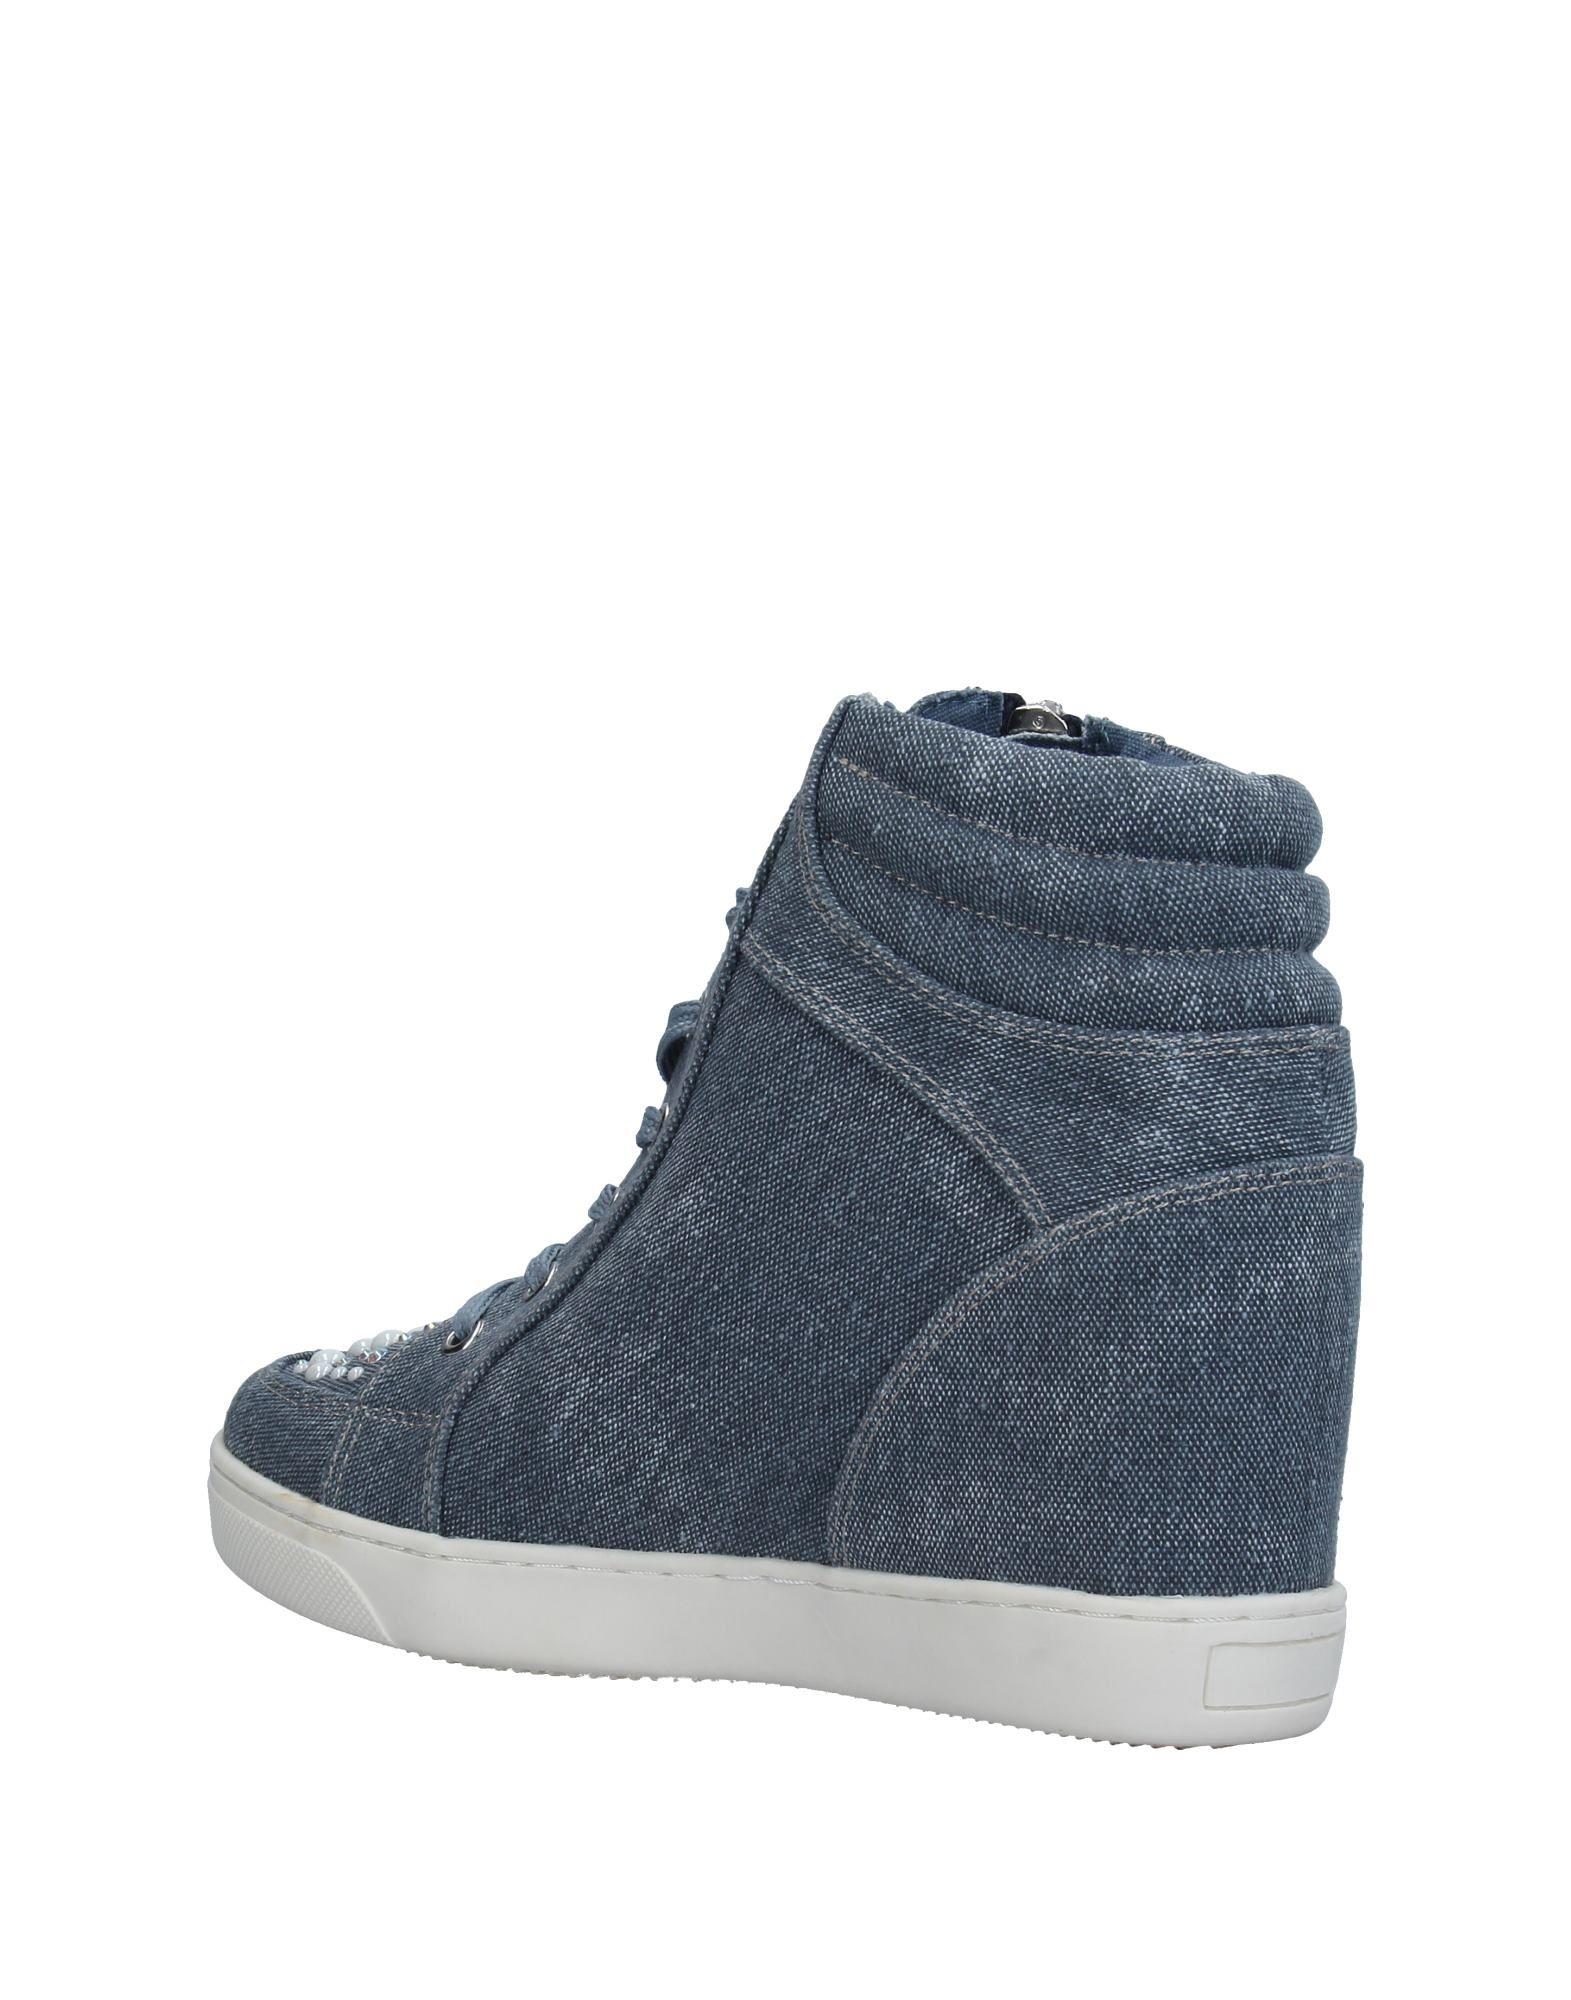 Sneakers Mercante Di Fiori Femme - Sneakers Mercante Di Fiori sur